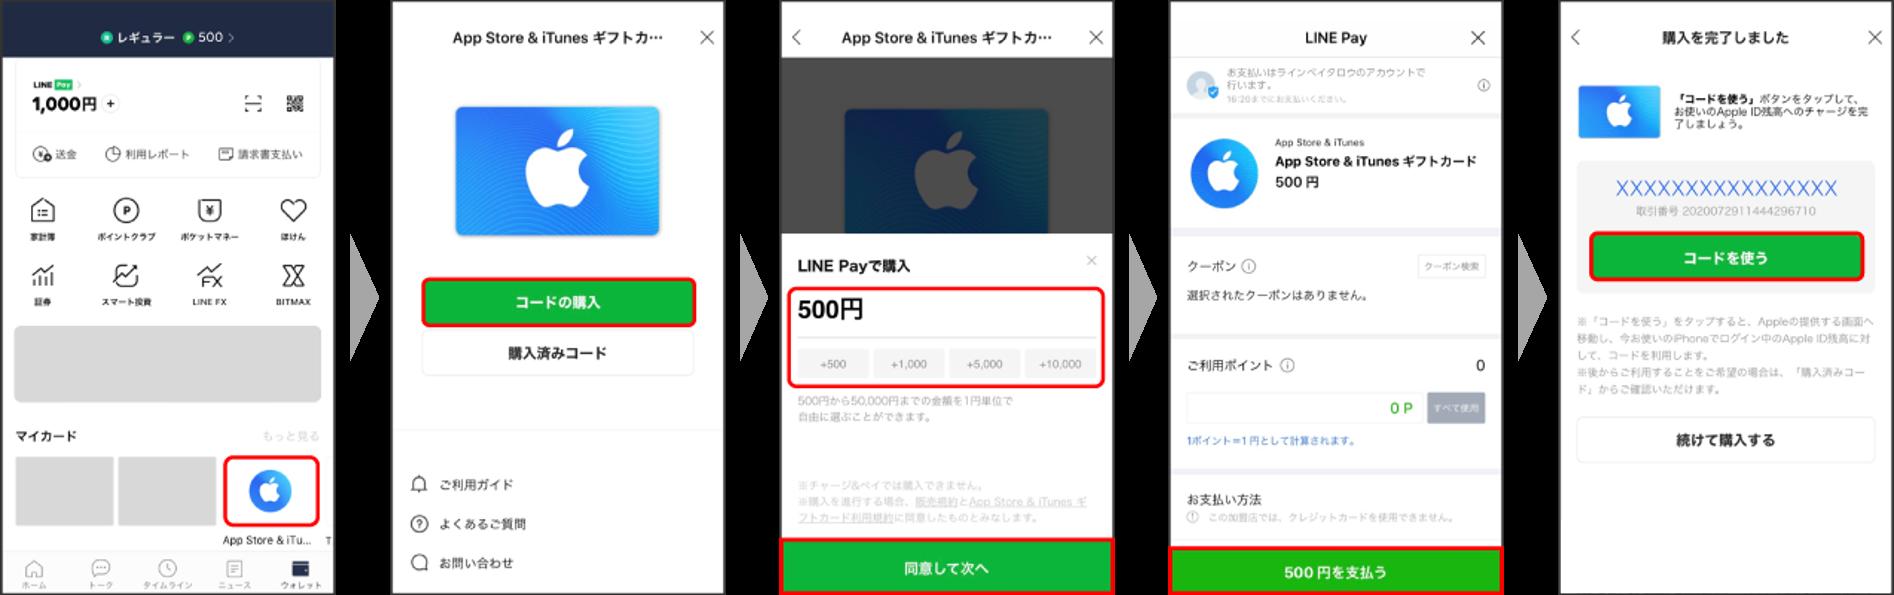 LINEPay_Appleギフトカード_購入方法